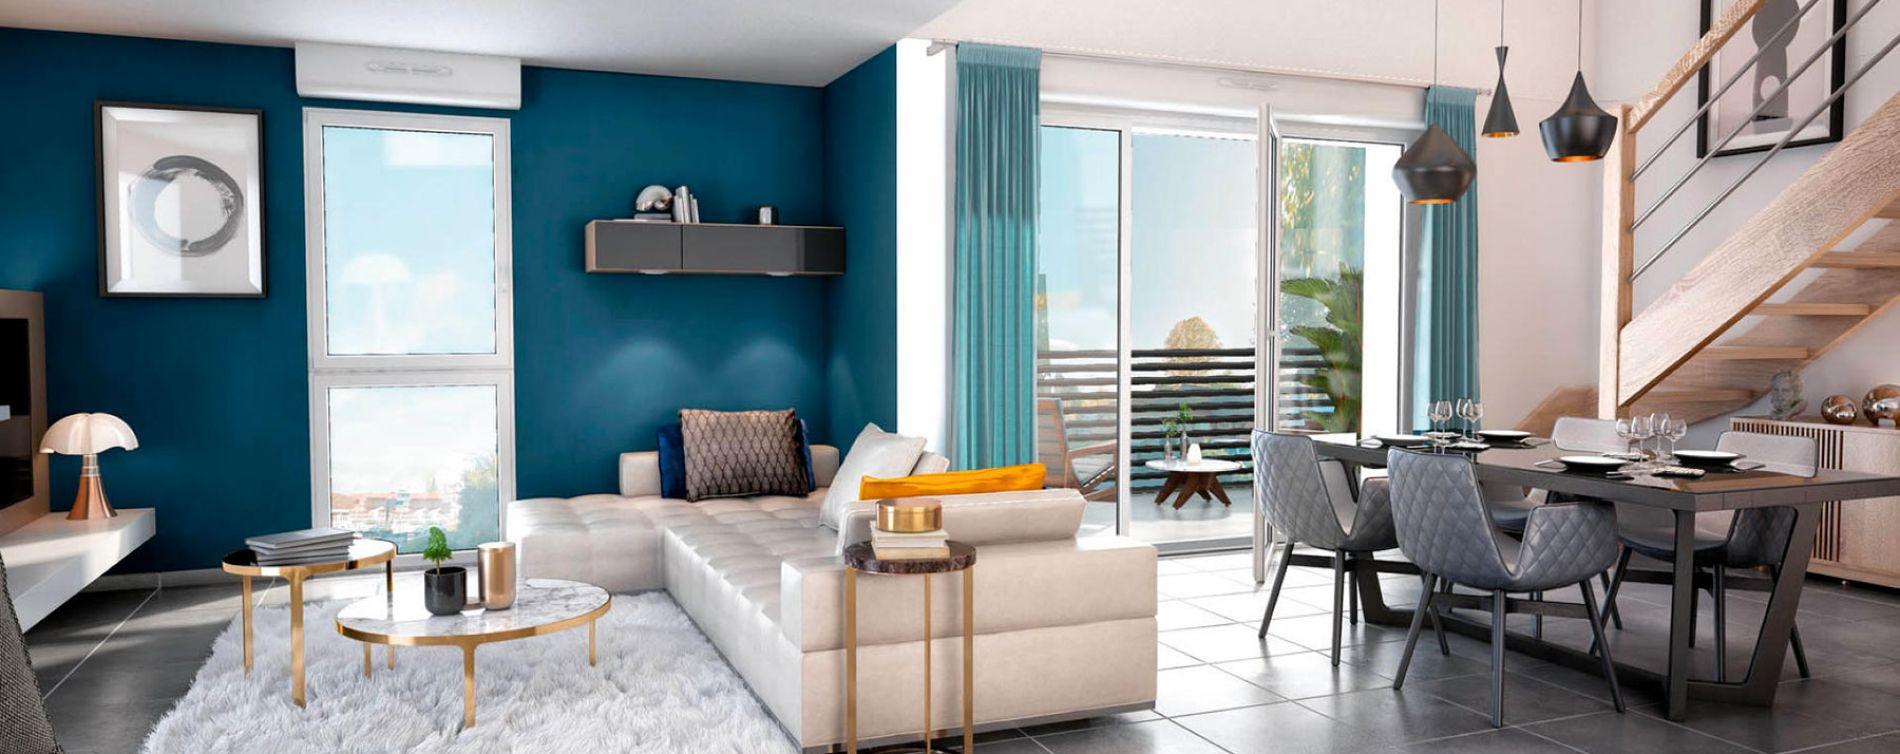 Gujan-Mestras : programme immobilier neuve « Programme immobilier n°214279 » (3)